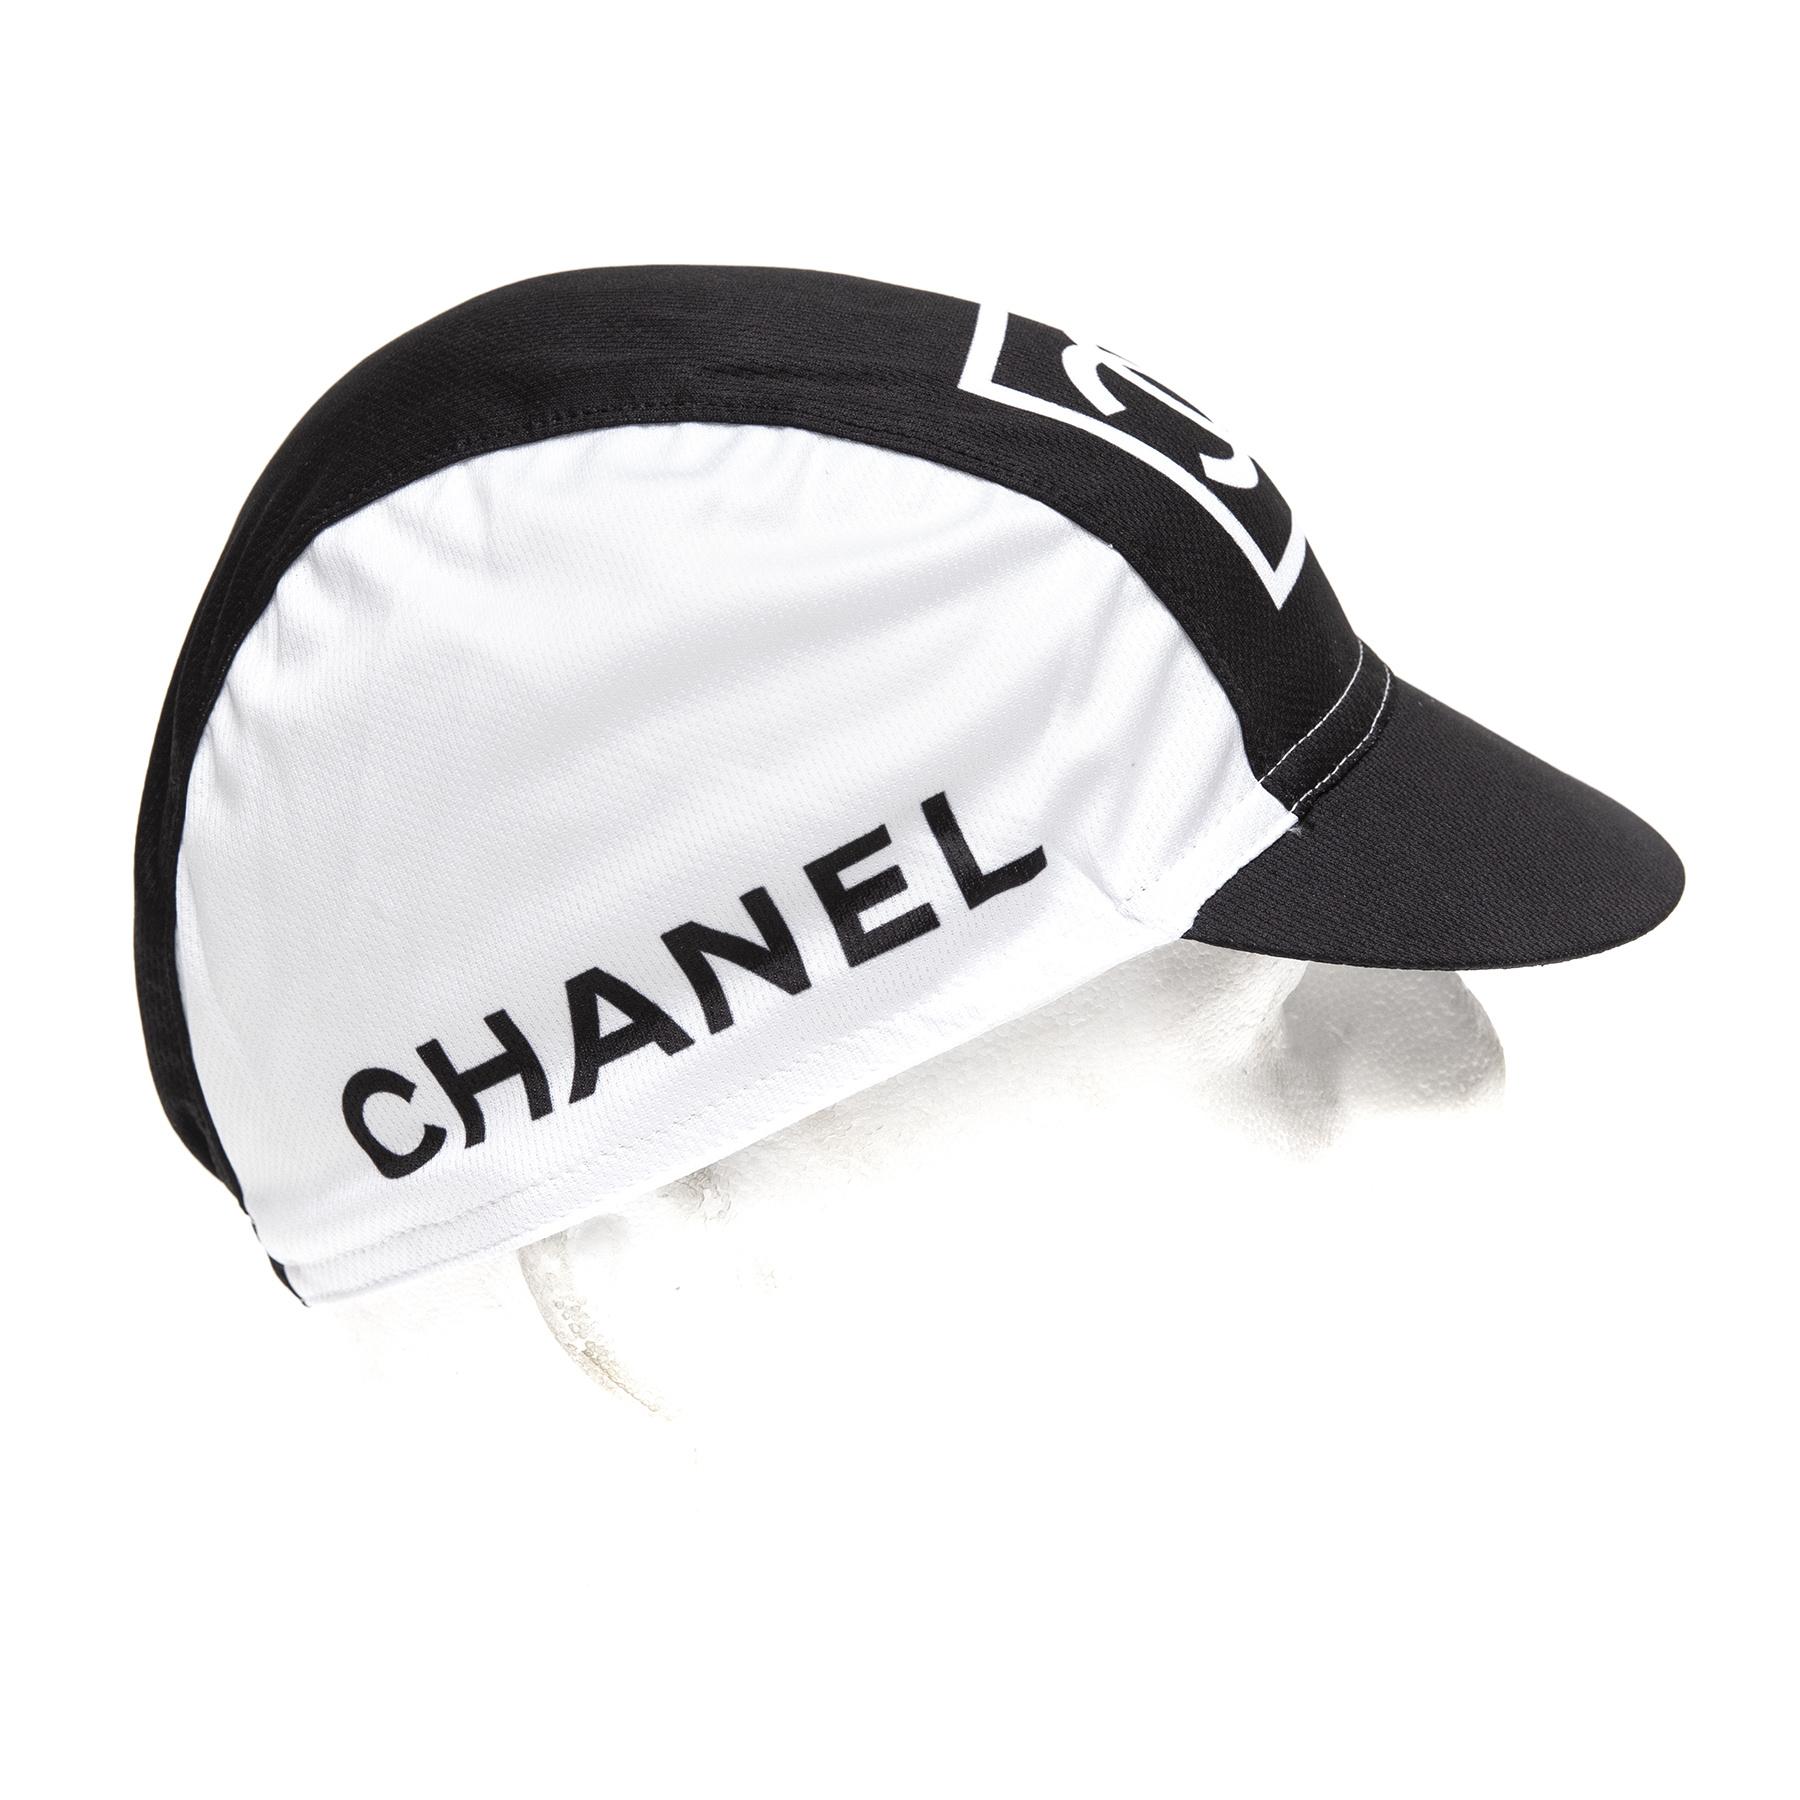 CHANEL Cycling Cap